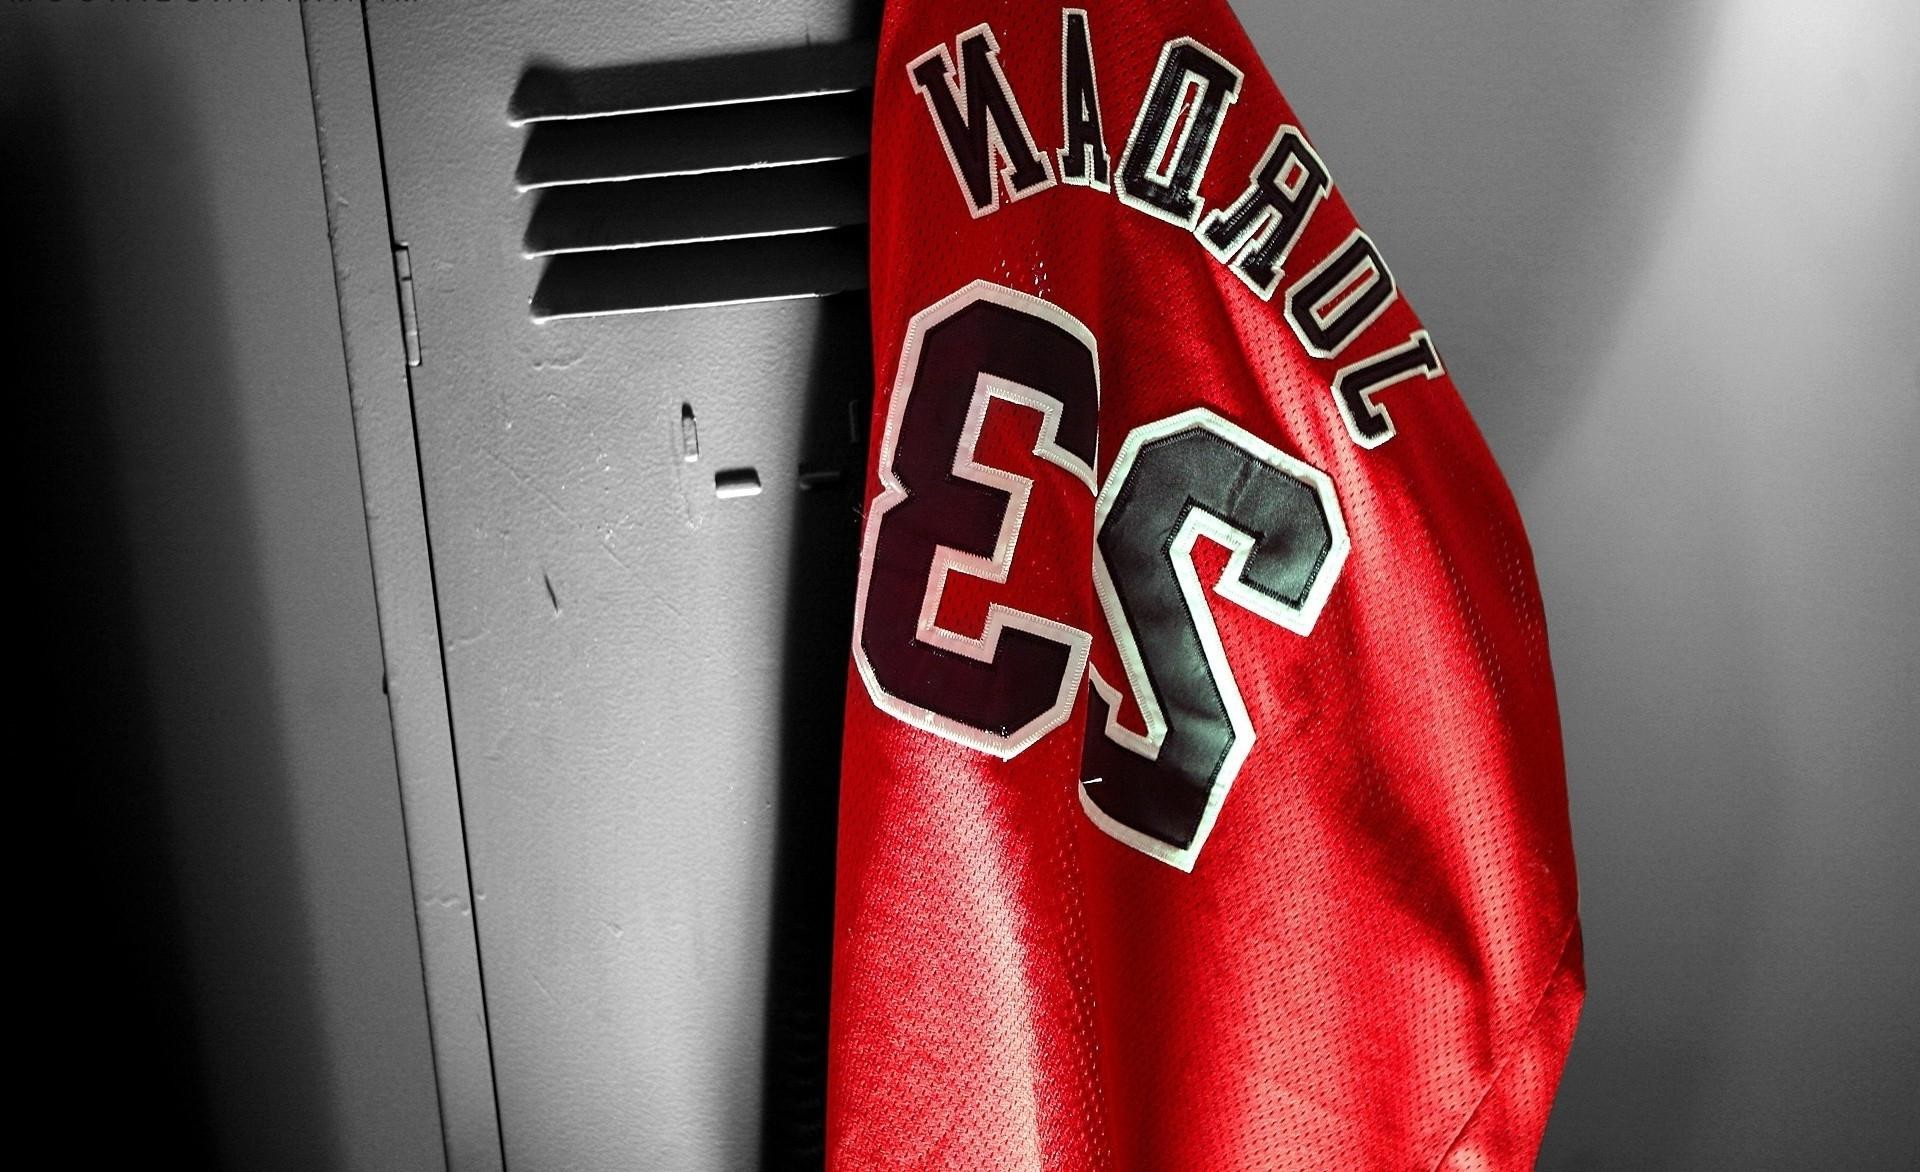 Res: 1920x1172, Nba Basketball Michael Jordan uniform Chicago Bulls 4K HD wallpaper |